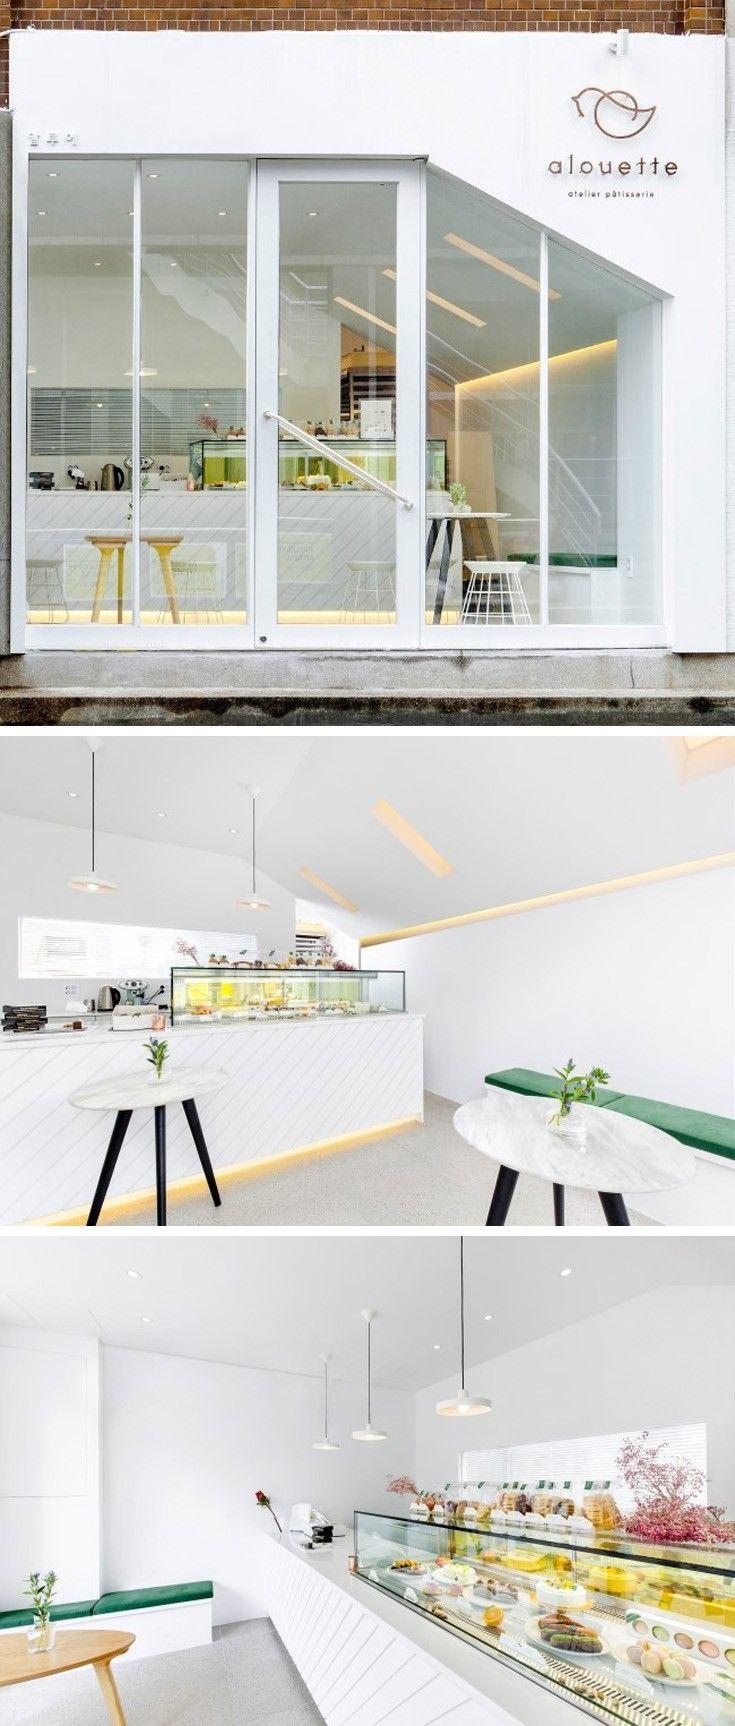 [No.52 알루에] 화이트 모던 디저트가게 인테리어 14평 white modern dessert shop interior design